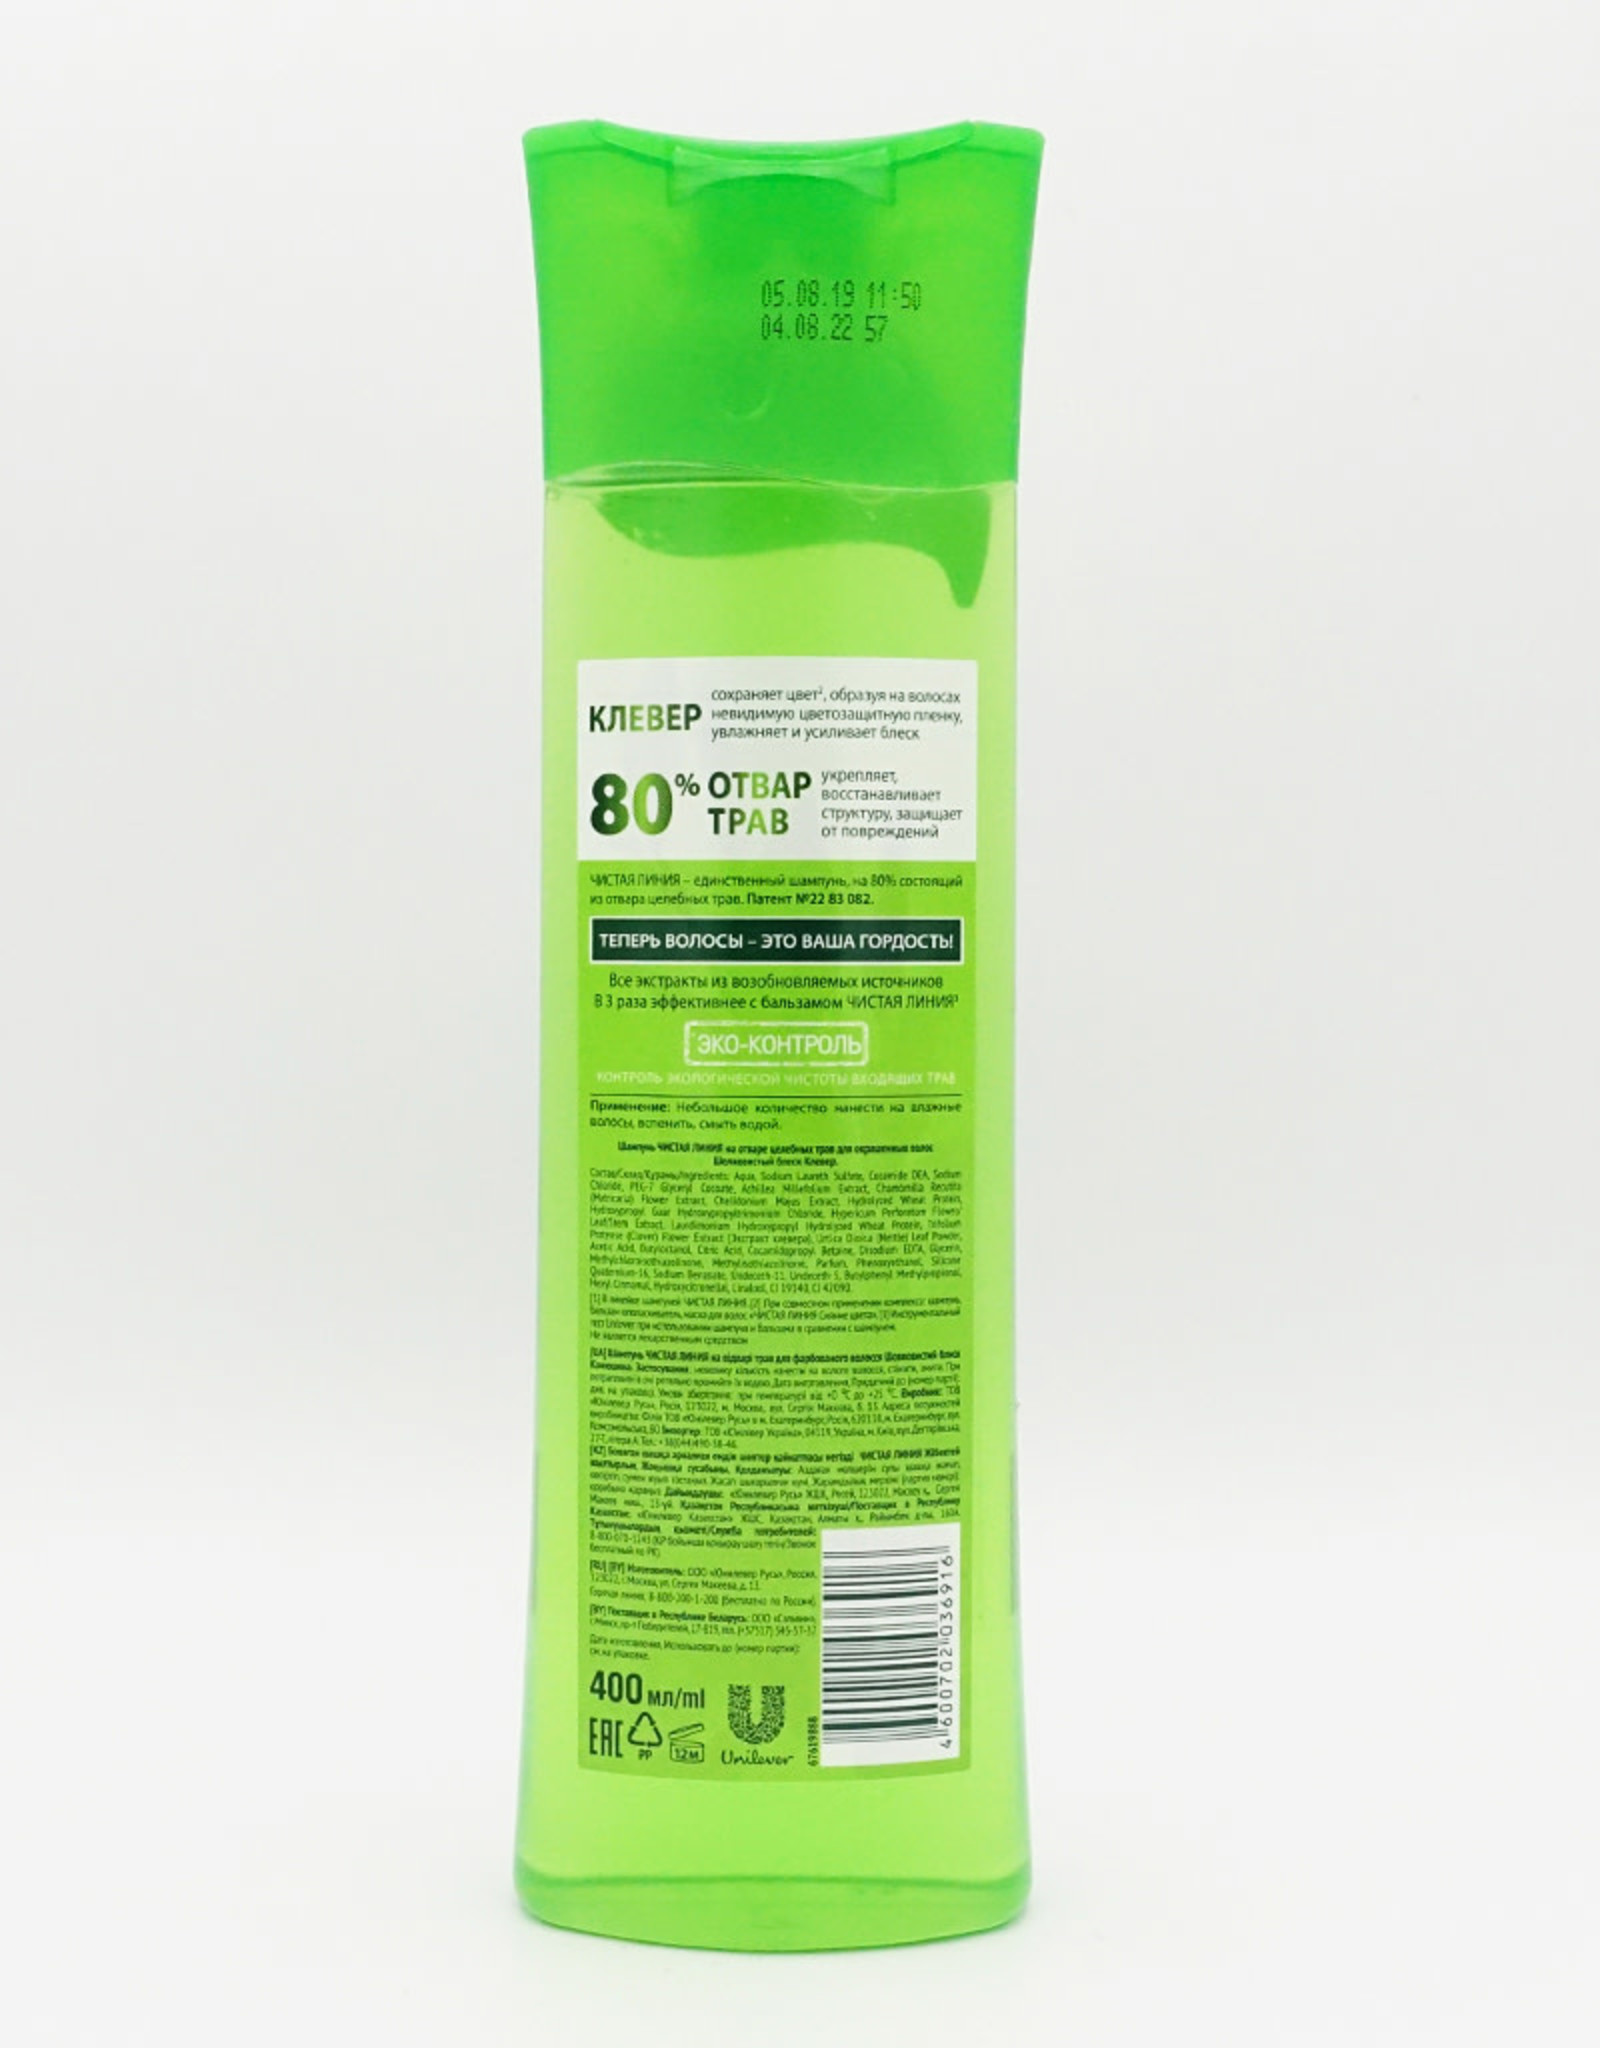 Чистая Линия Clean Line, Shampoo Silky Gloss, Clover 400ml